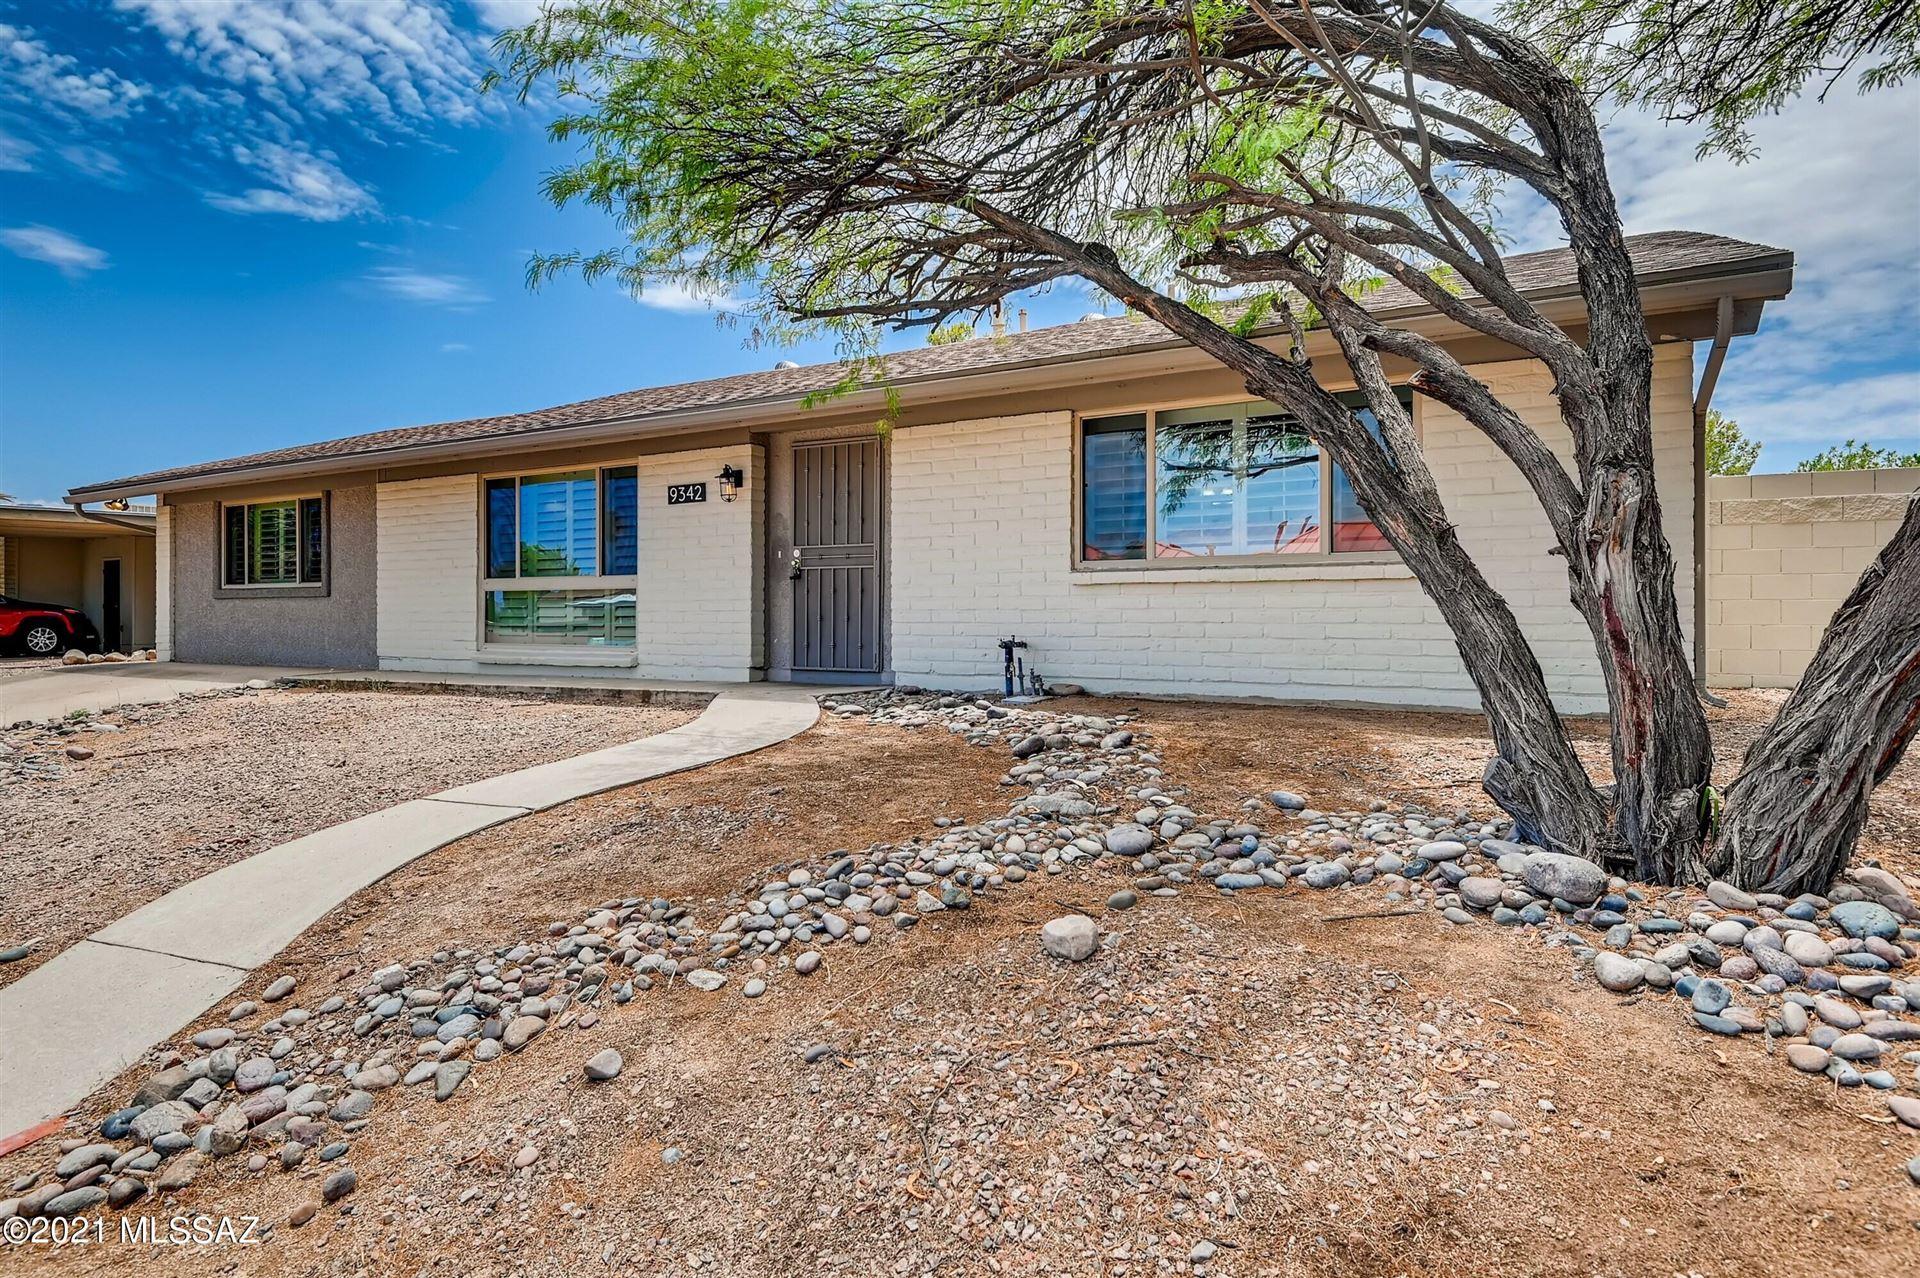 9342 E Calle Kuehn, Tucson, AZ 85715 - MLS#: 22117900